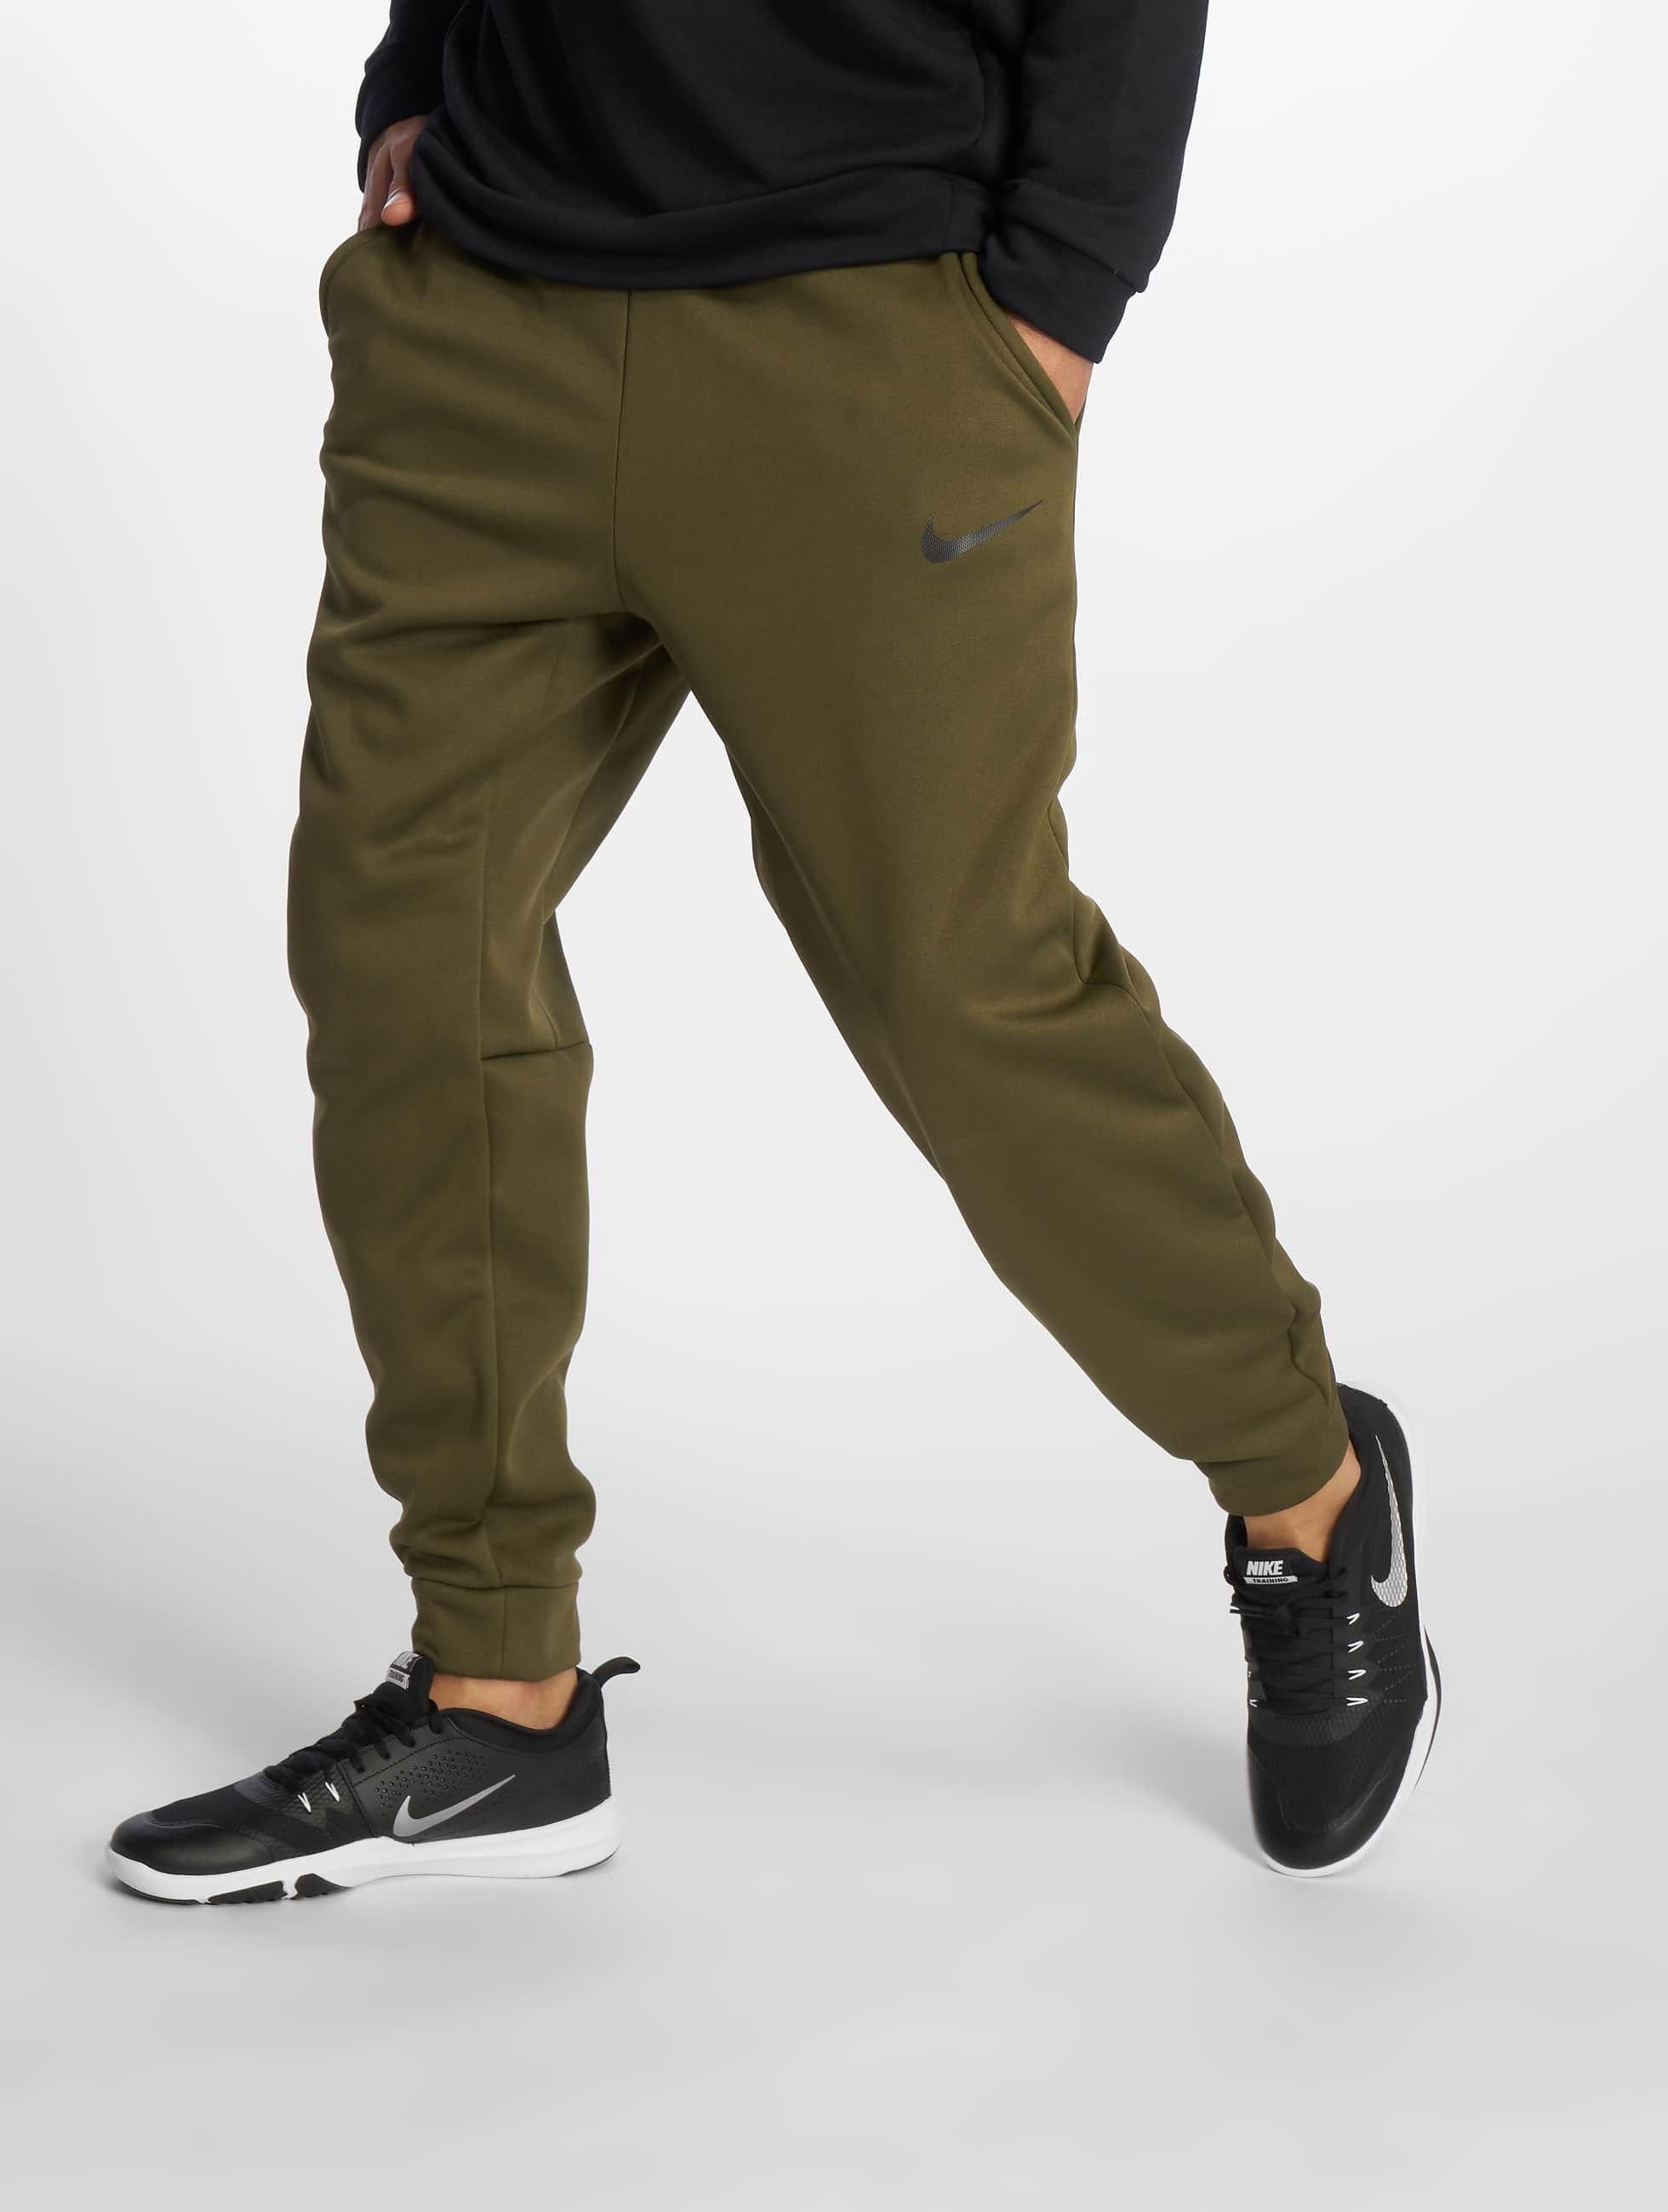 ba55bed88305c6 Nike Herren Jogginghose Thrma Taper in olive 581991